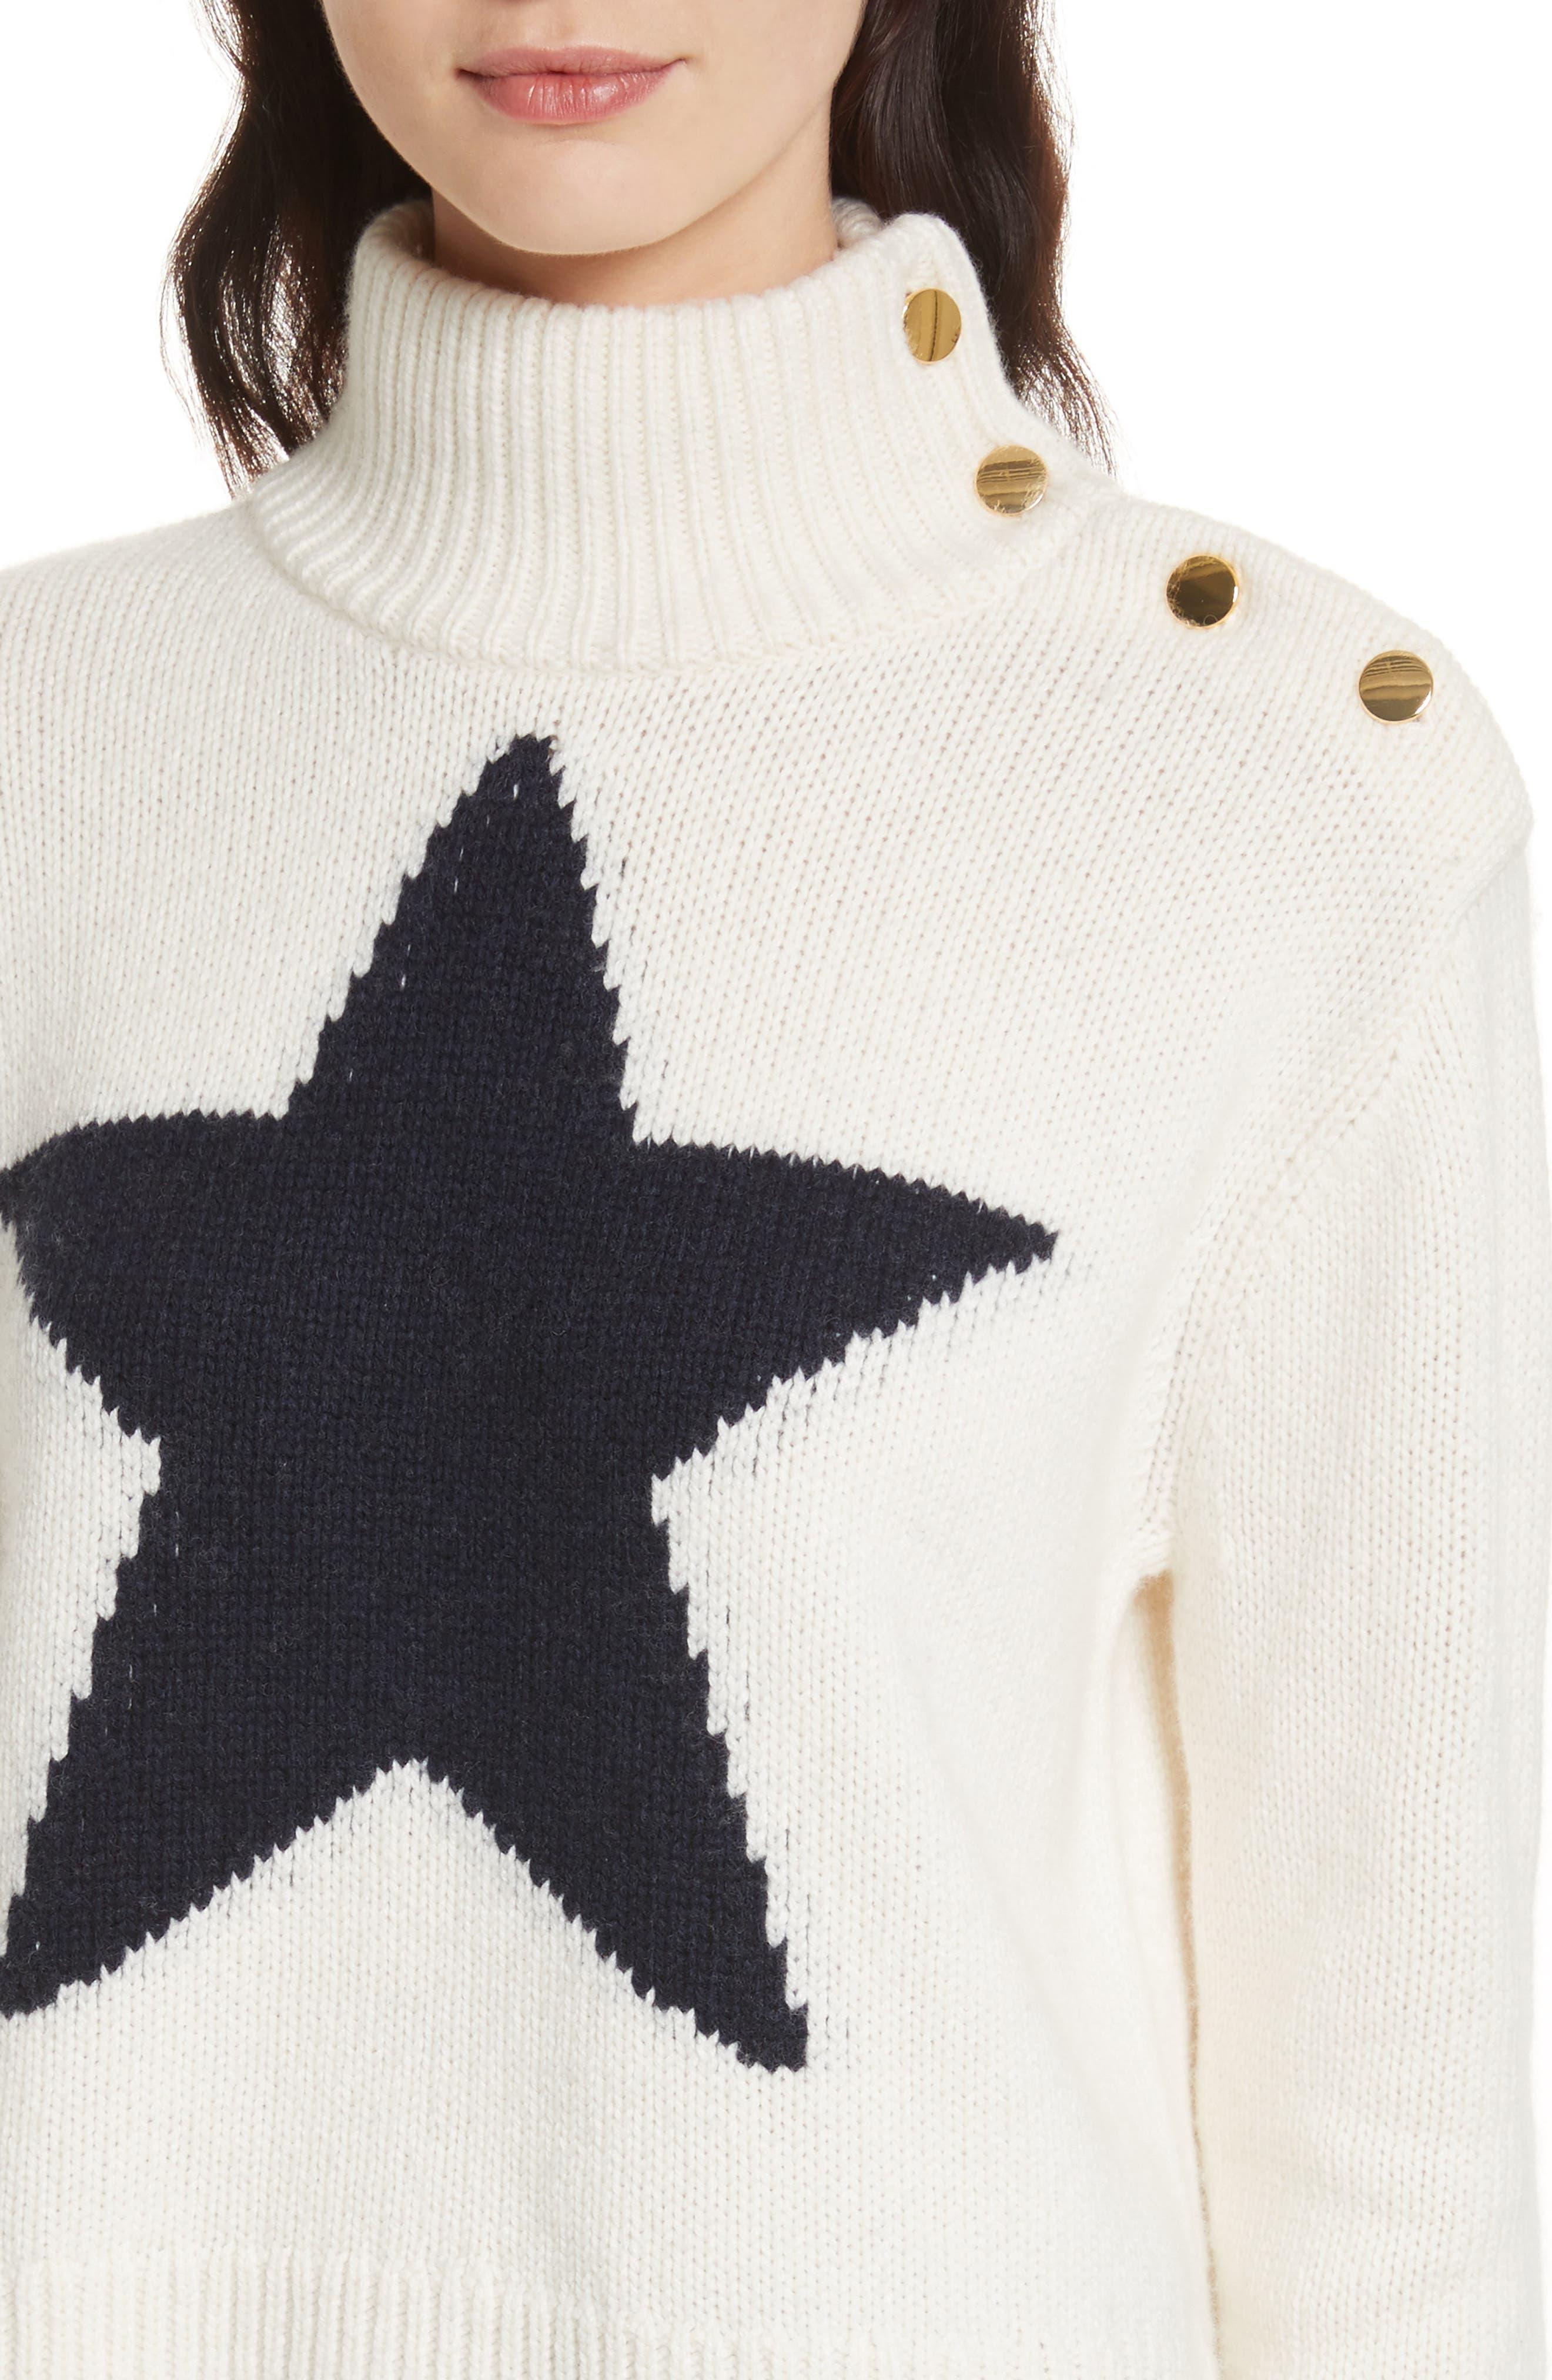 star turtleneck sweater,                             Alternate thumbnail 6, color,                             Cream/ Navy